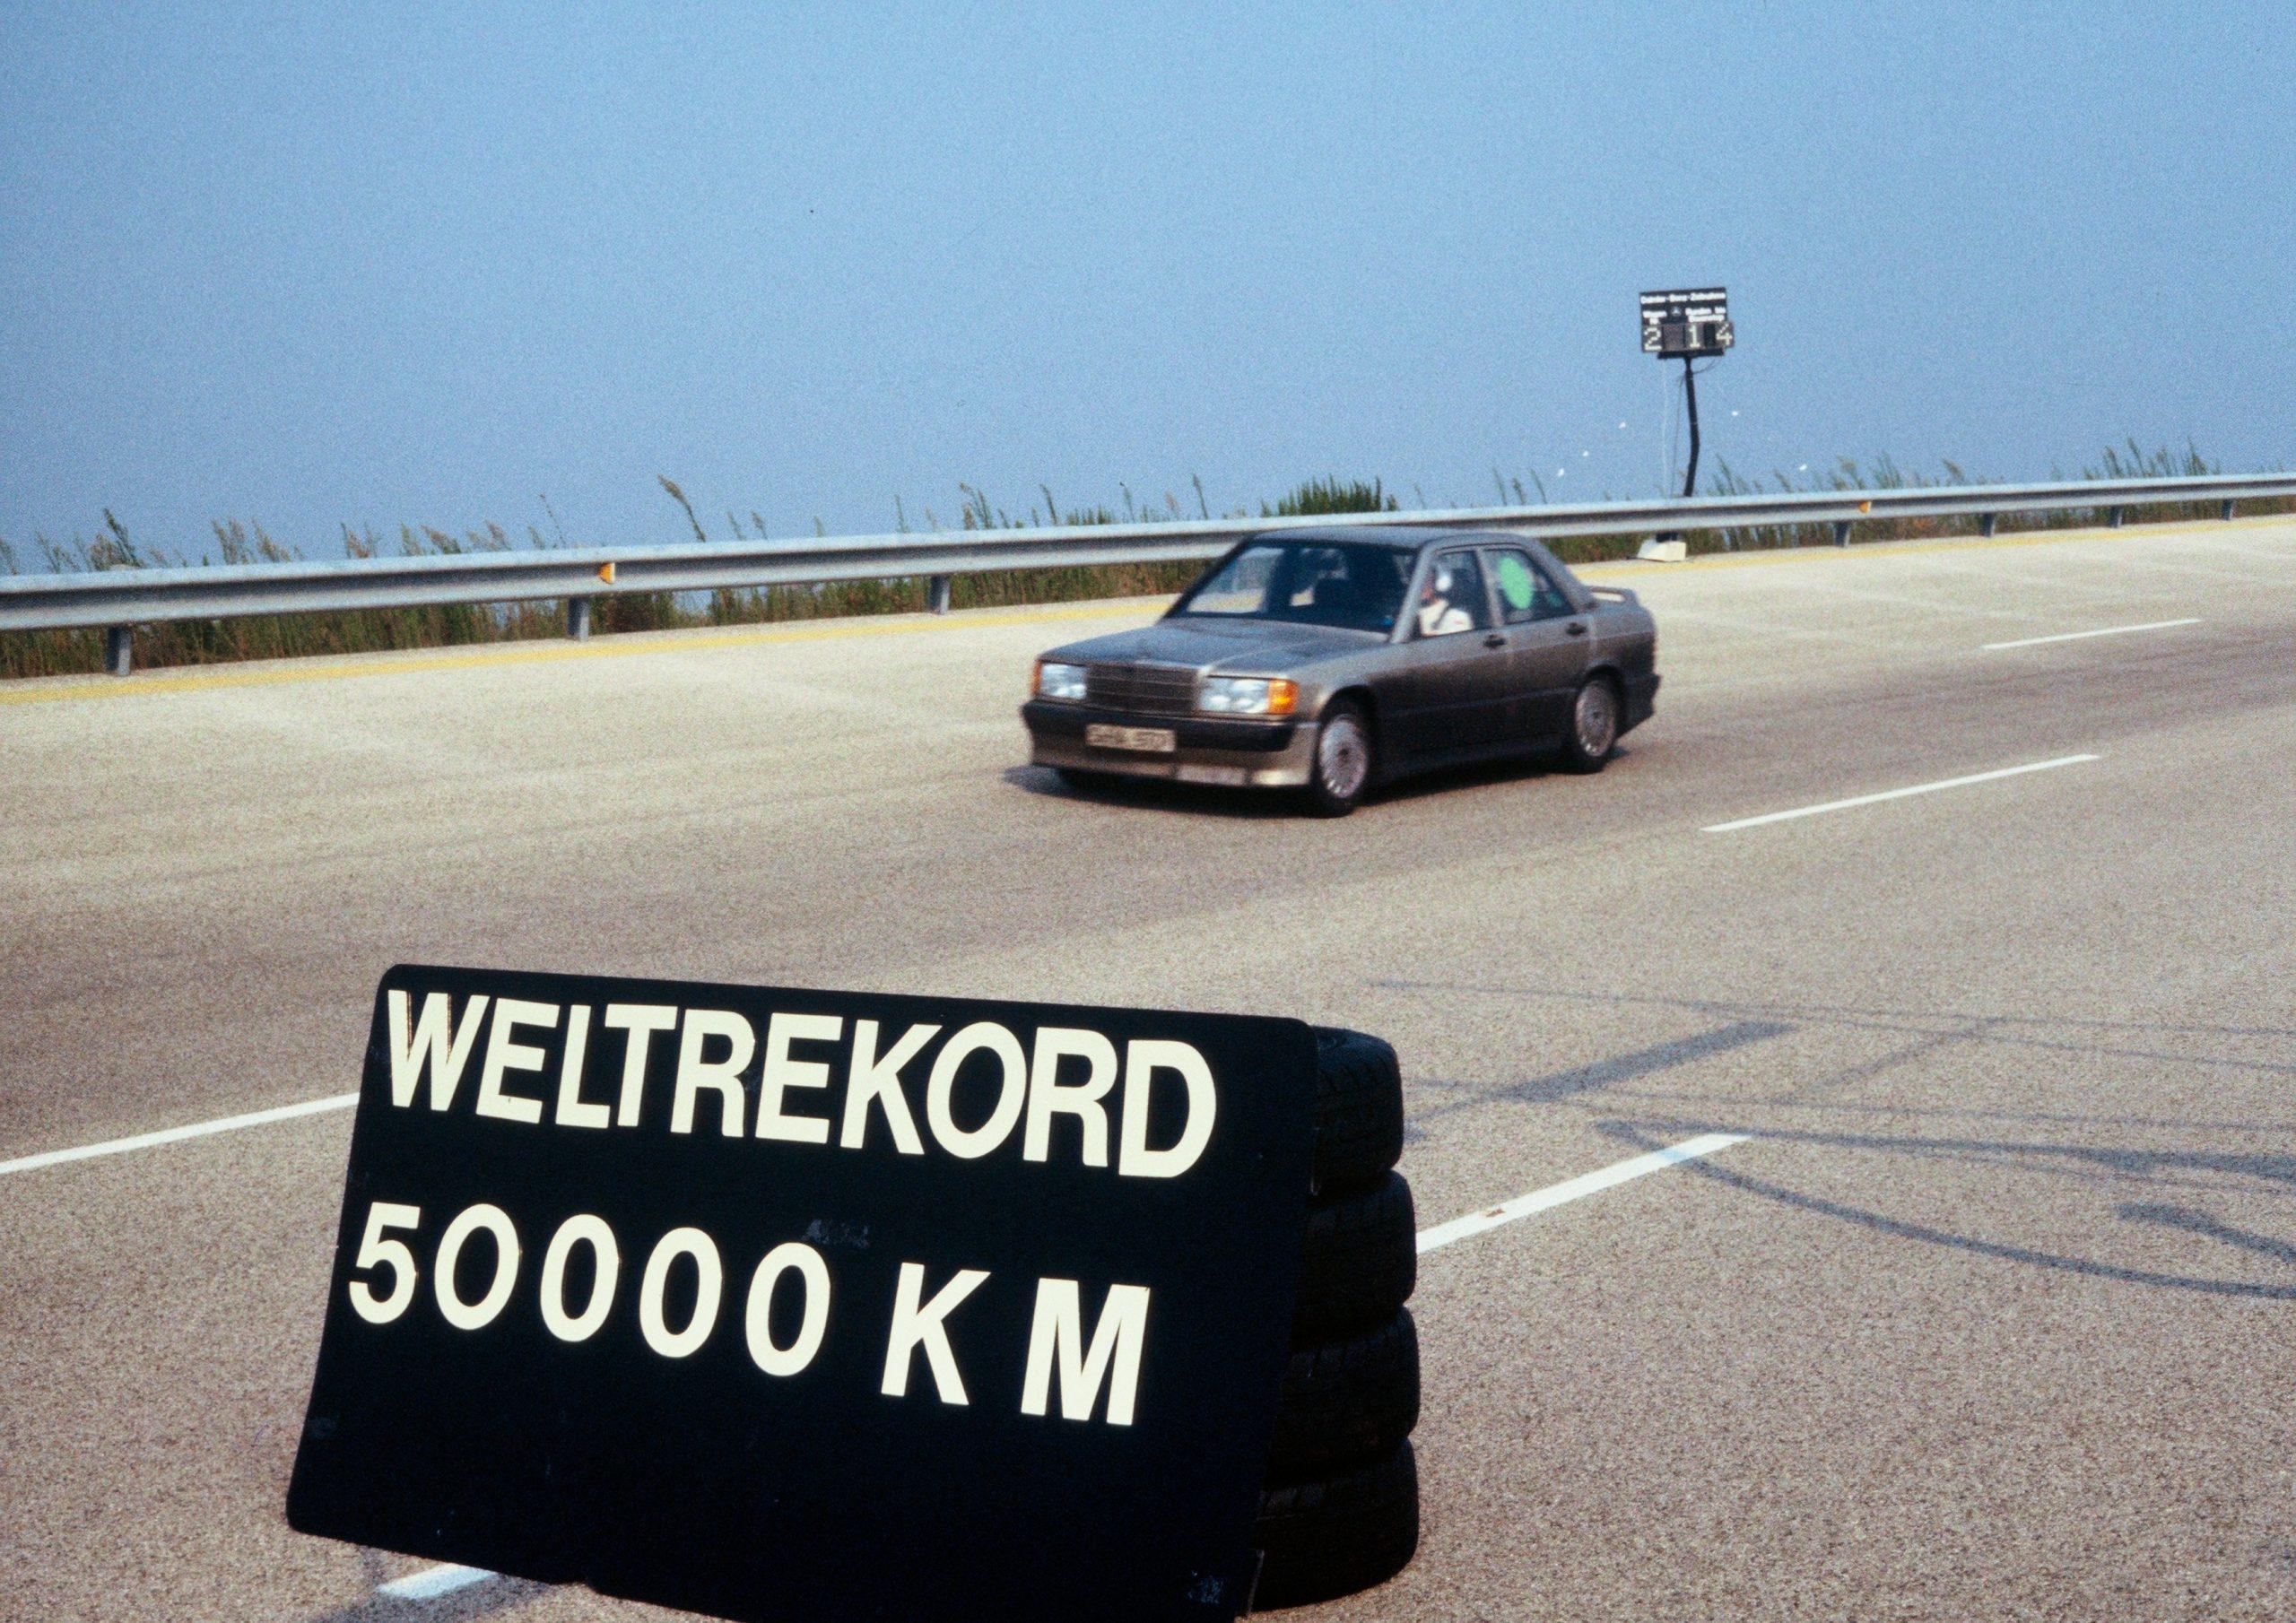 Mercedes 190 E 2.3 16 Nardo record attempt